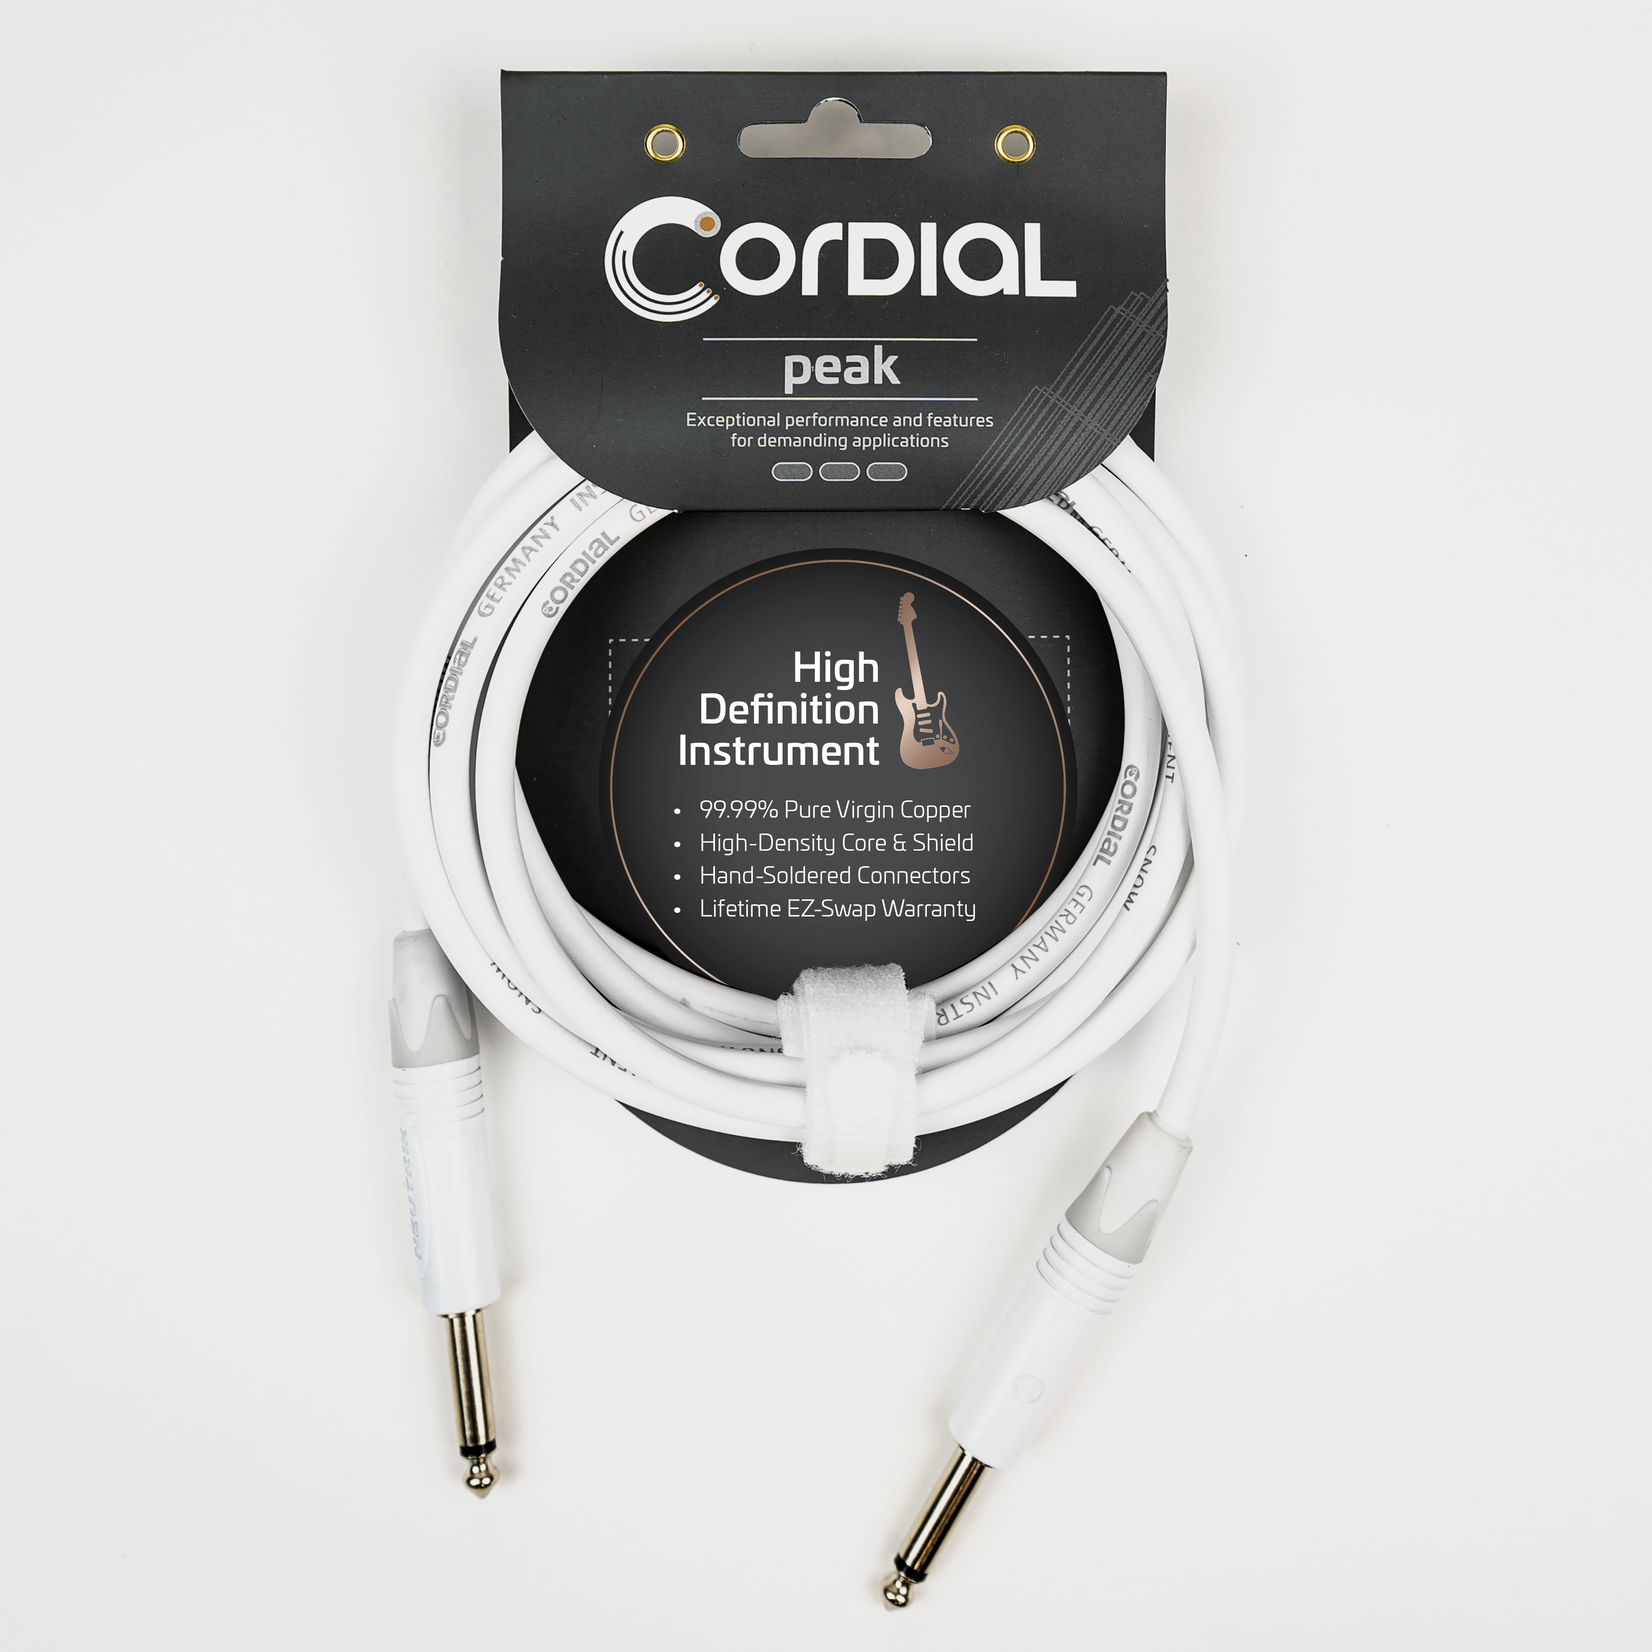 Cordial Cables Cordial 3m /~10ft Instrument Cable for Stage, 1/4'' Neutrik Connectors, CXI 3 PP-SNOW (Germany)